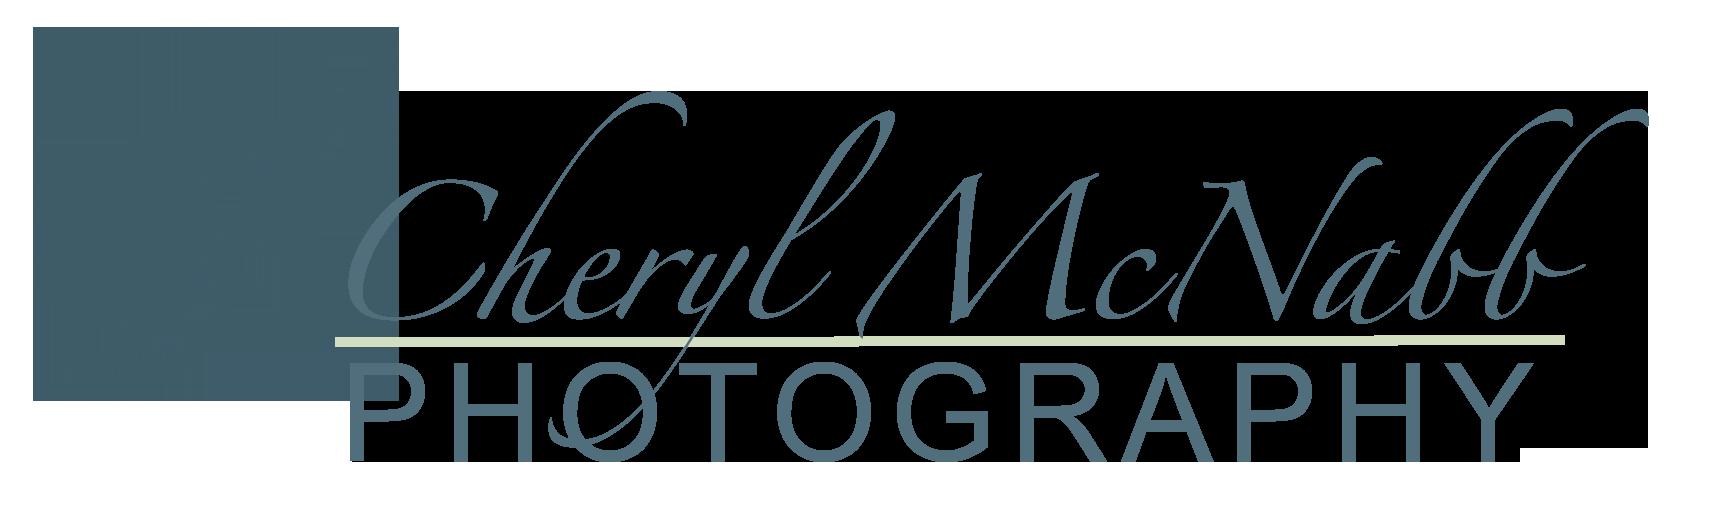 Cheryl McNabb Photography